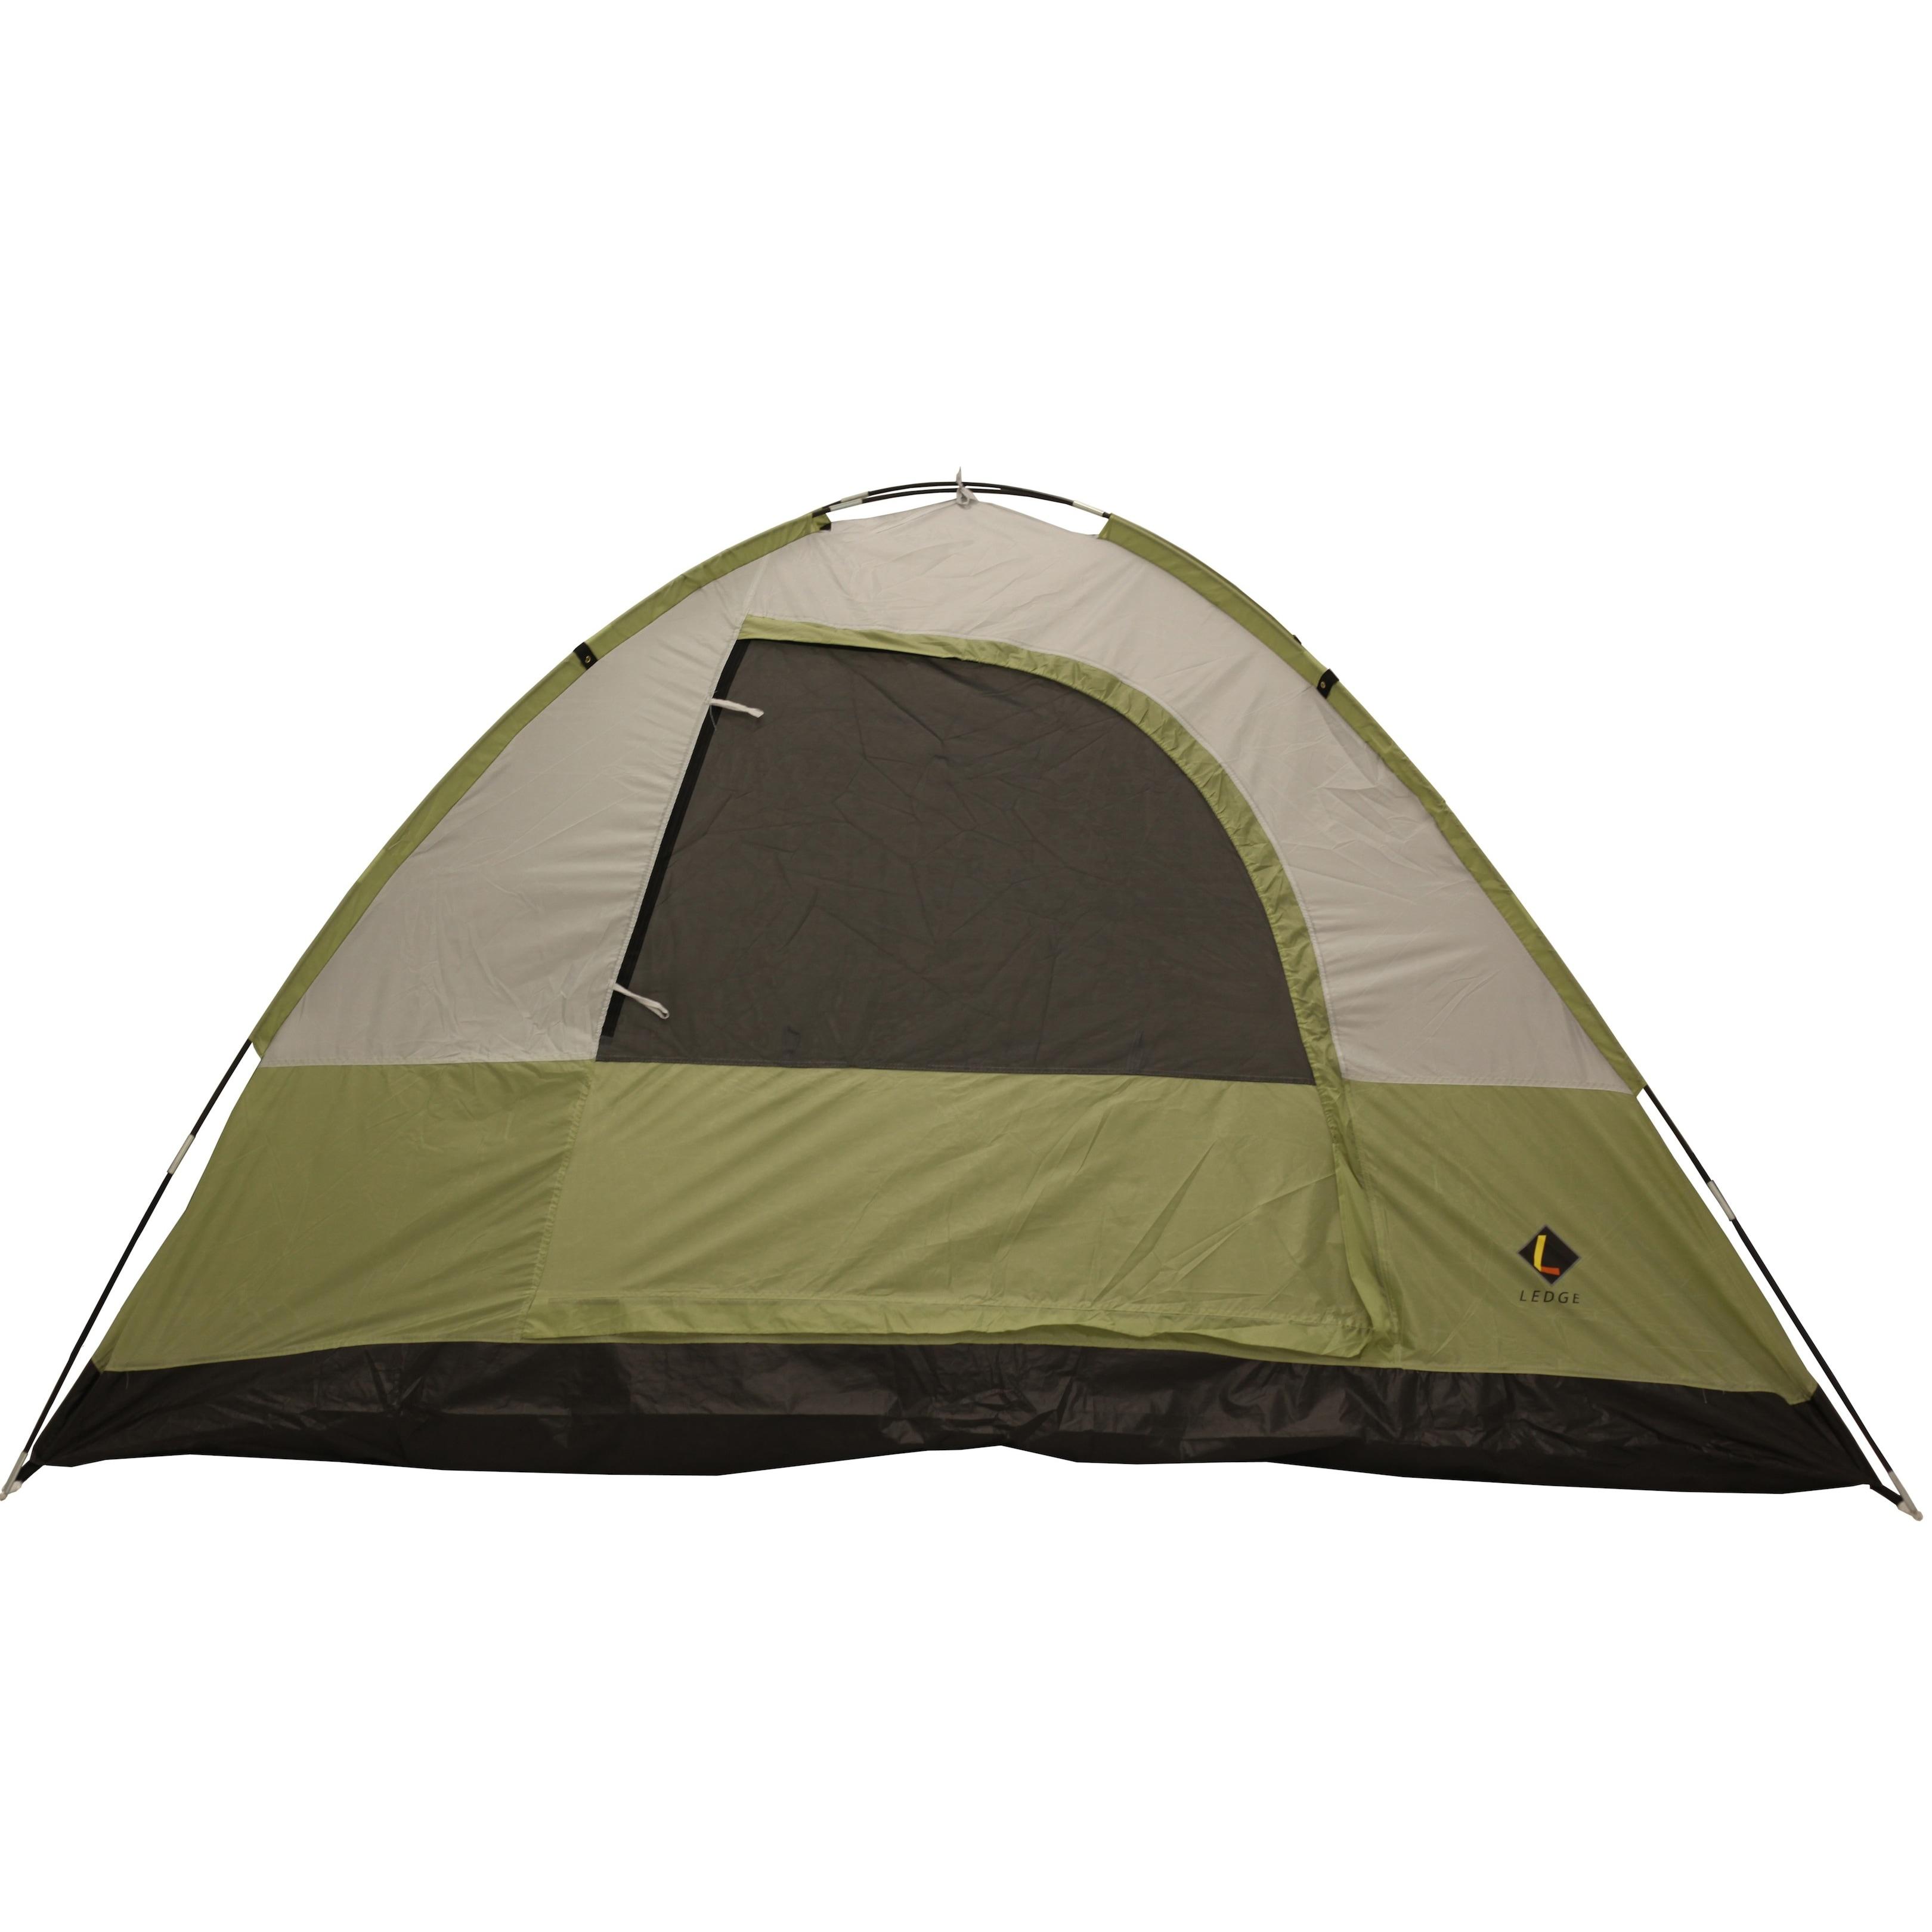 Ledge Sports Ridge 4 Person Tent (9 x 7) - Free Shipping Today - Overstock.com - 15020151  sc 1 st  Overstock.com & Ledge Sports Ridge 4 Person Tent (9 x 7) - Free Shipping Today ...